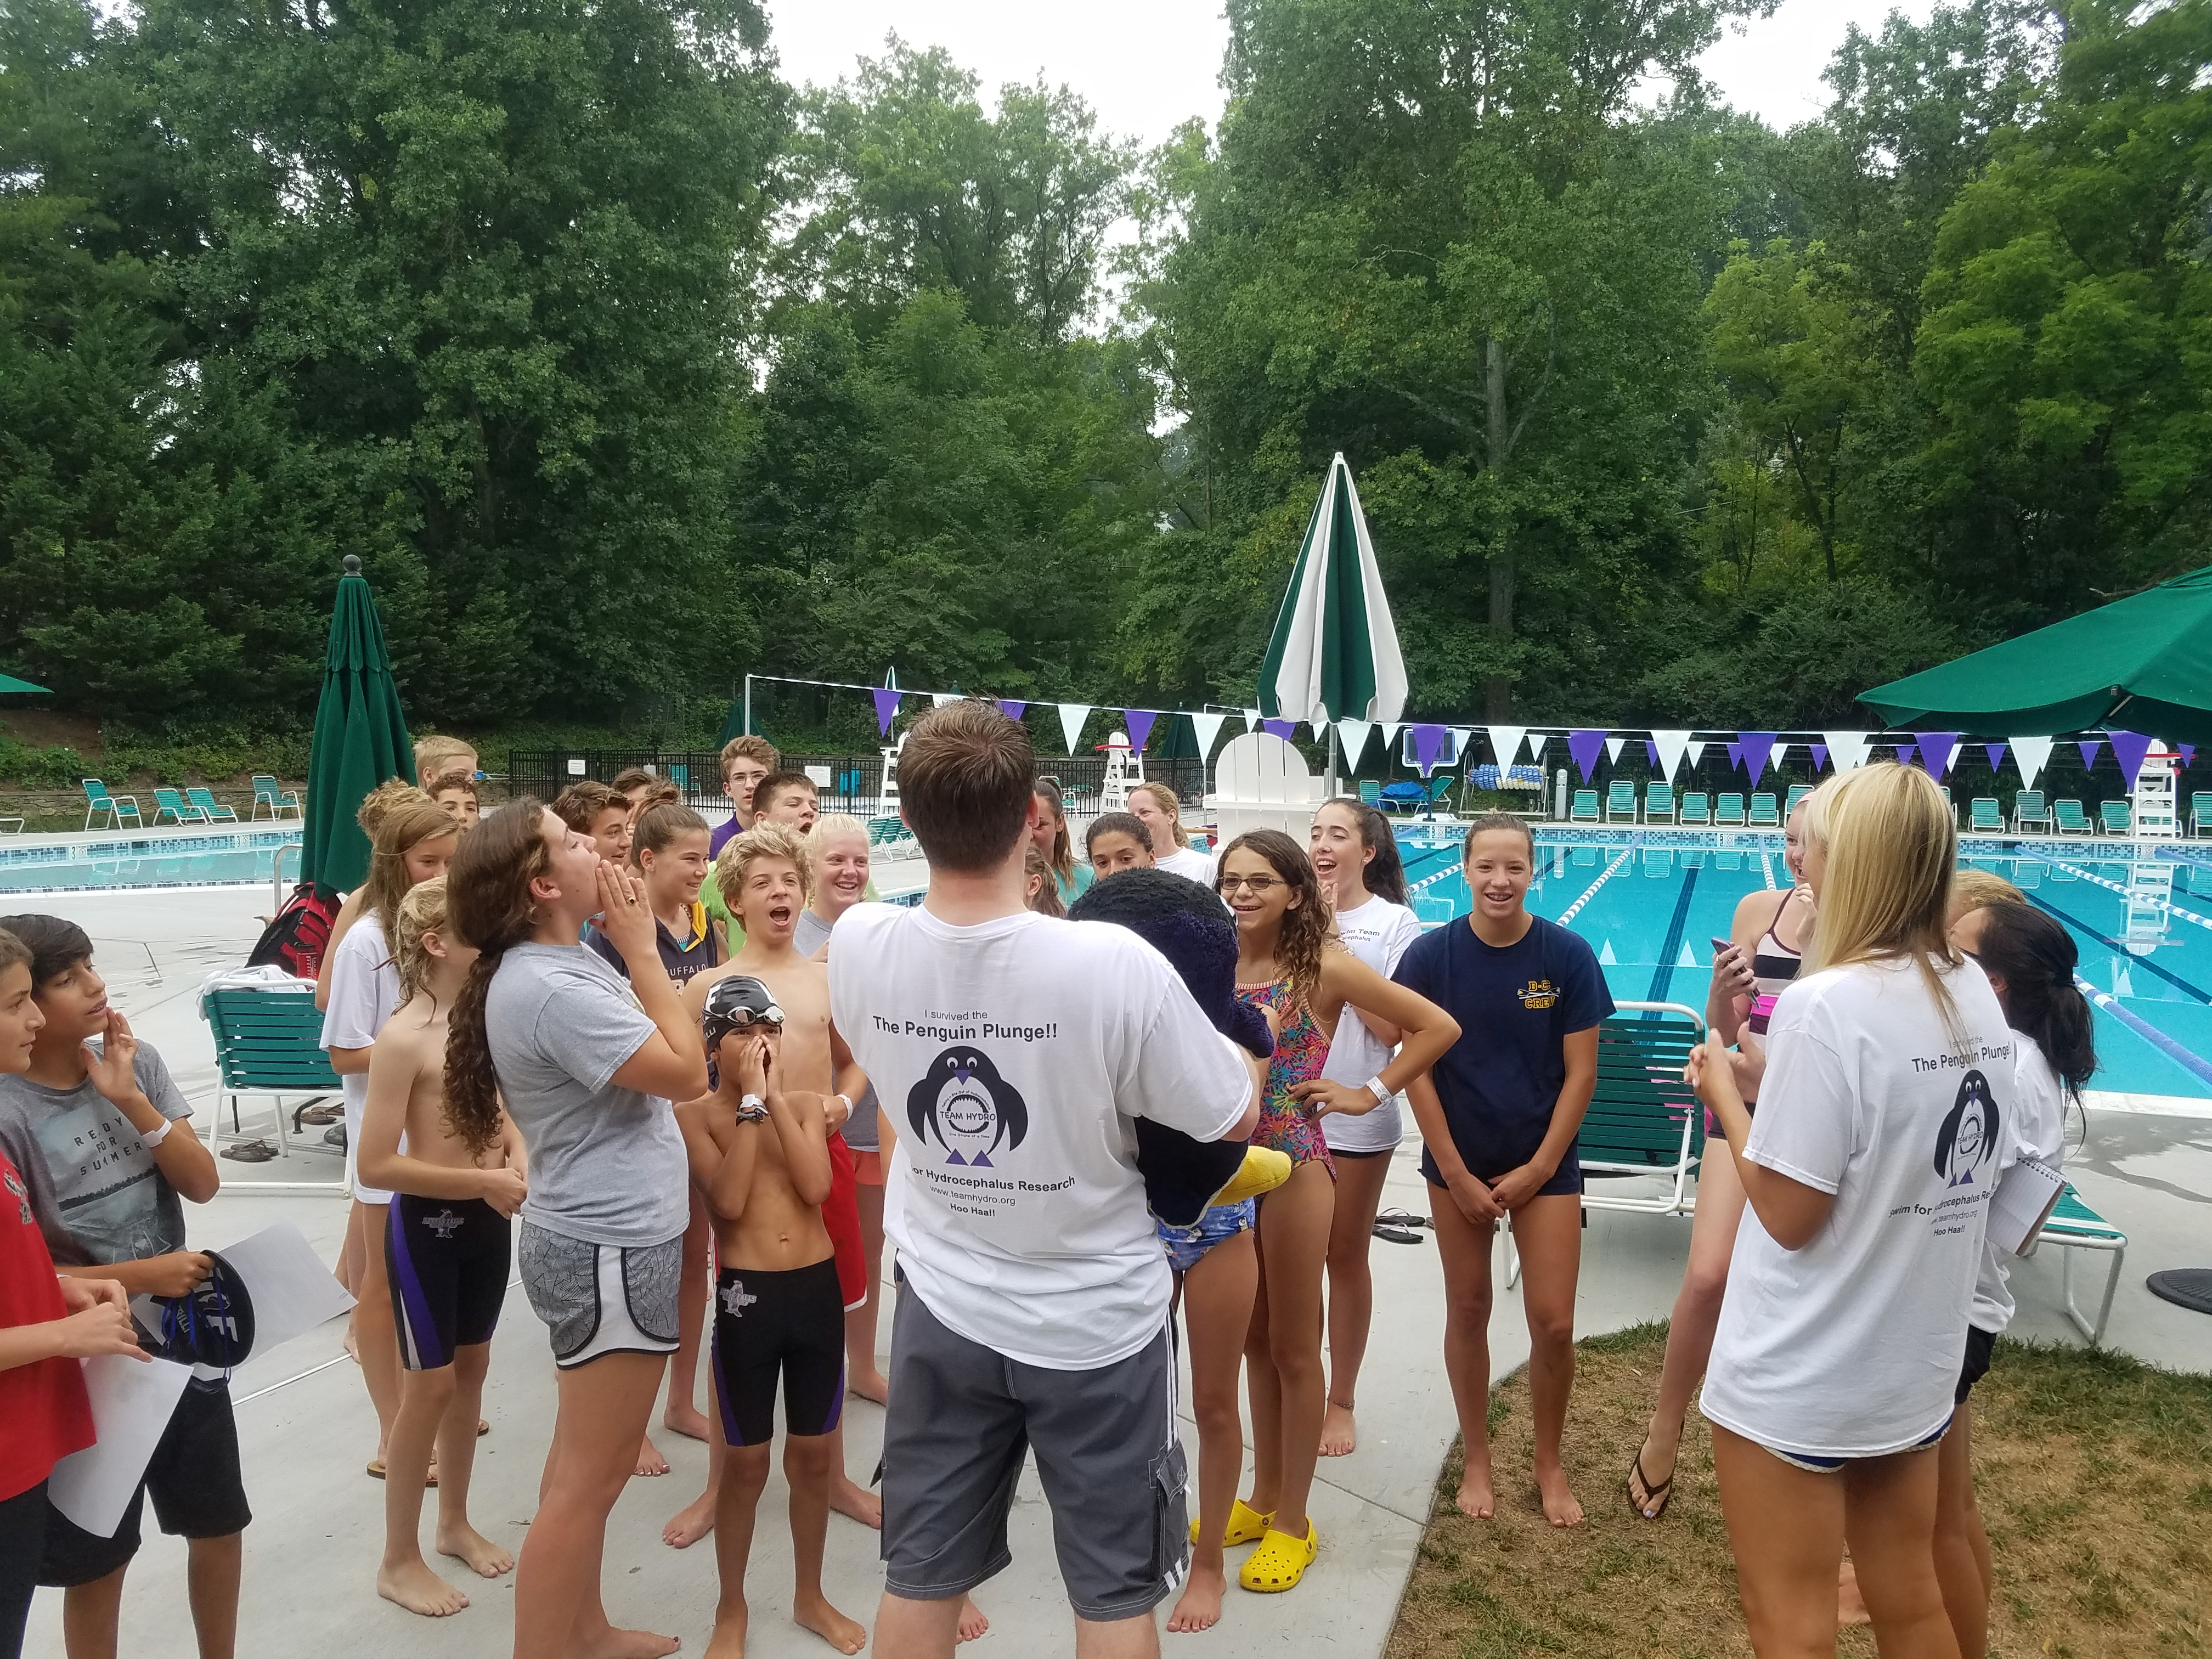 A team cheer before the swim!